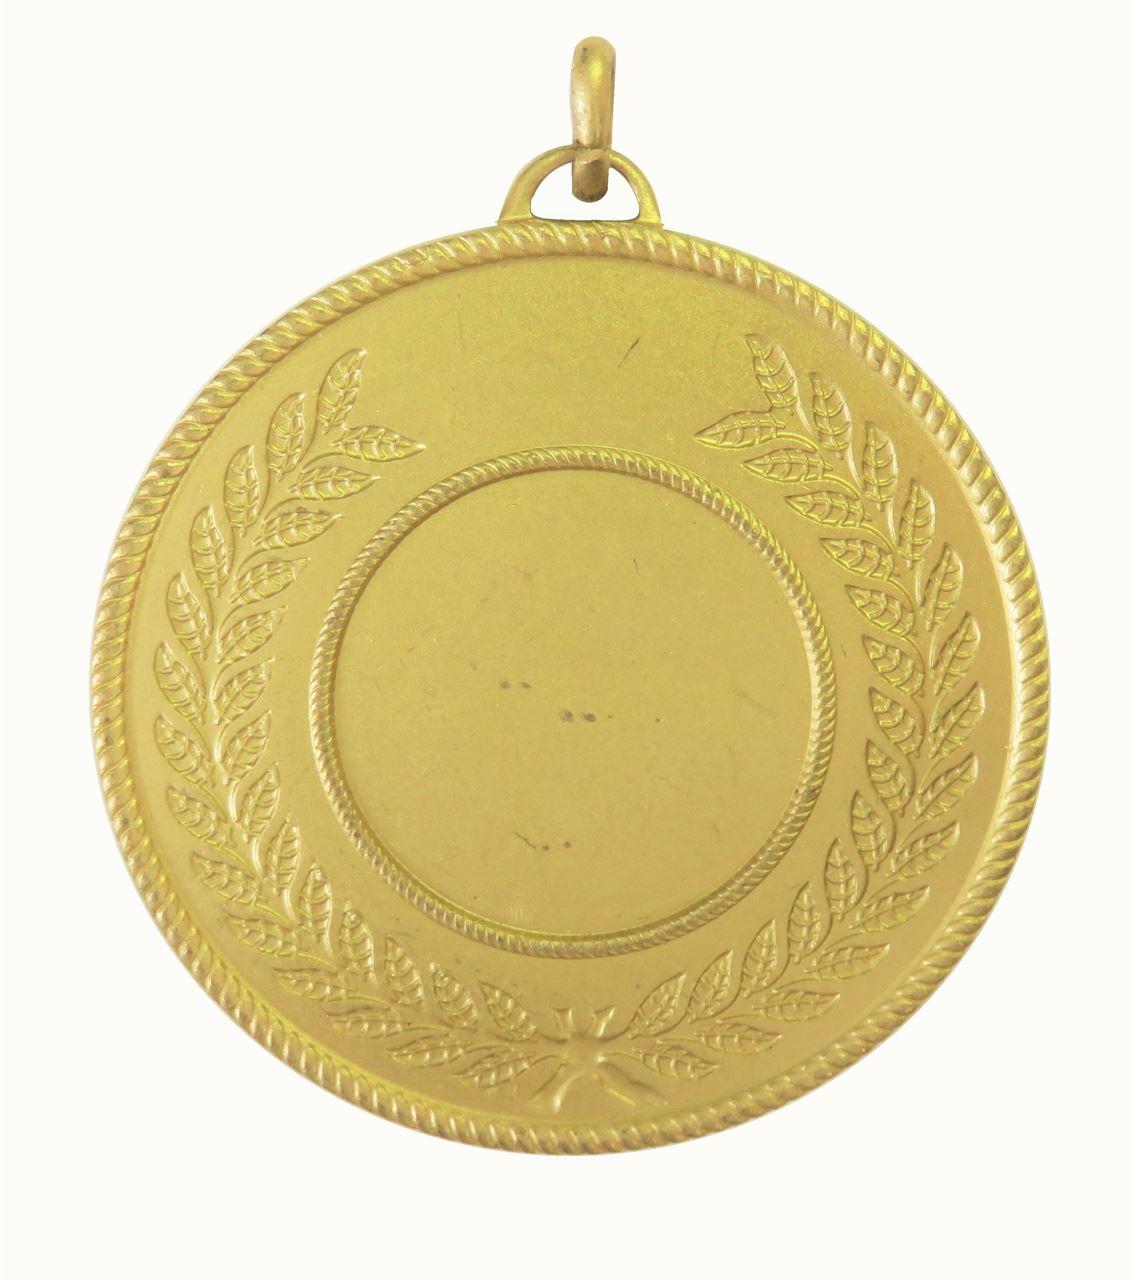 Gold Quality Laurel Surround Medal (size: 50mm) - 5820E